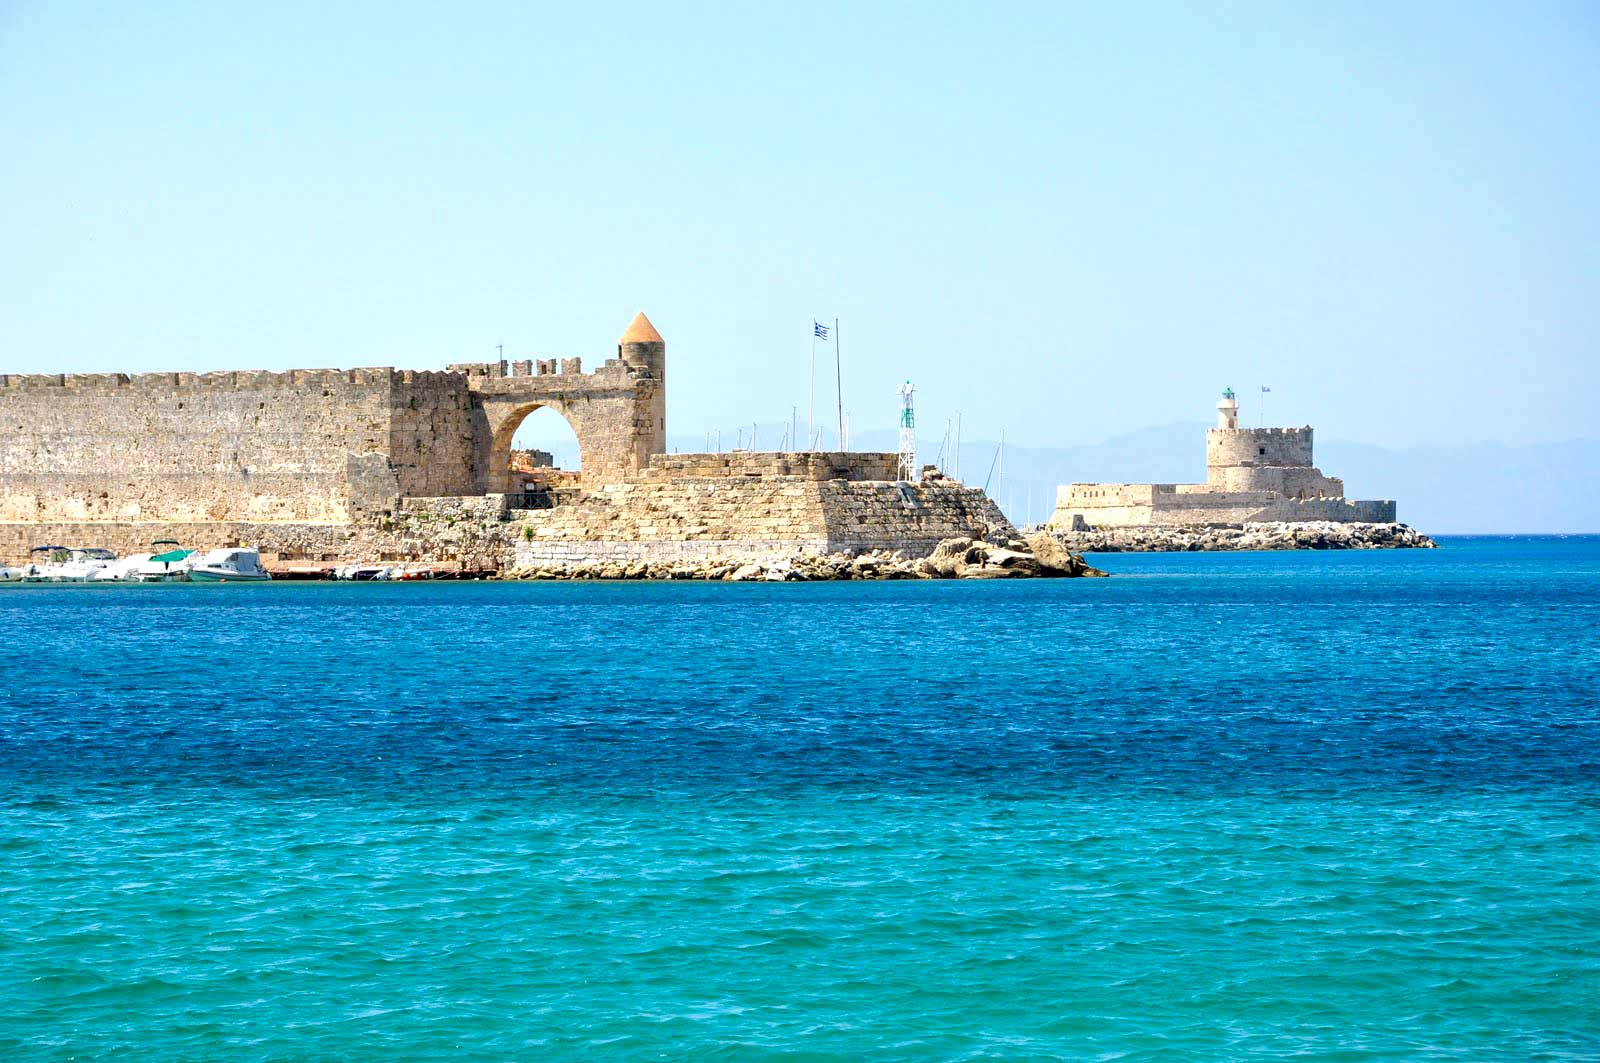 Grčko ostrvo Rodos